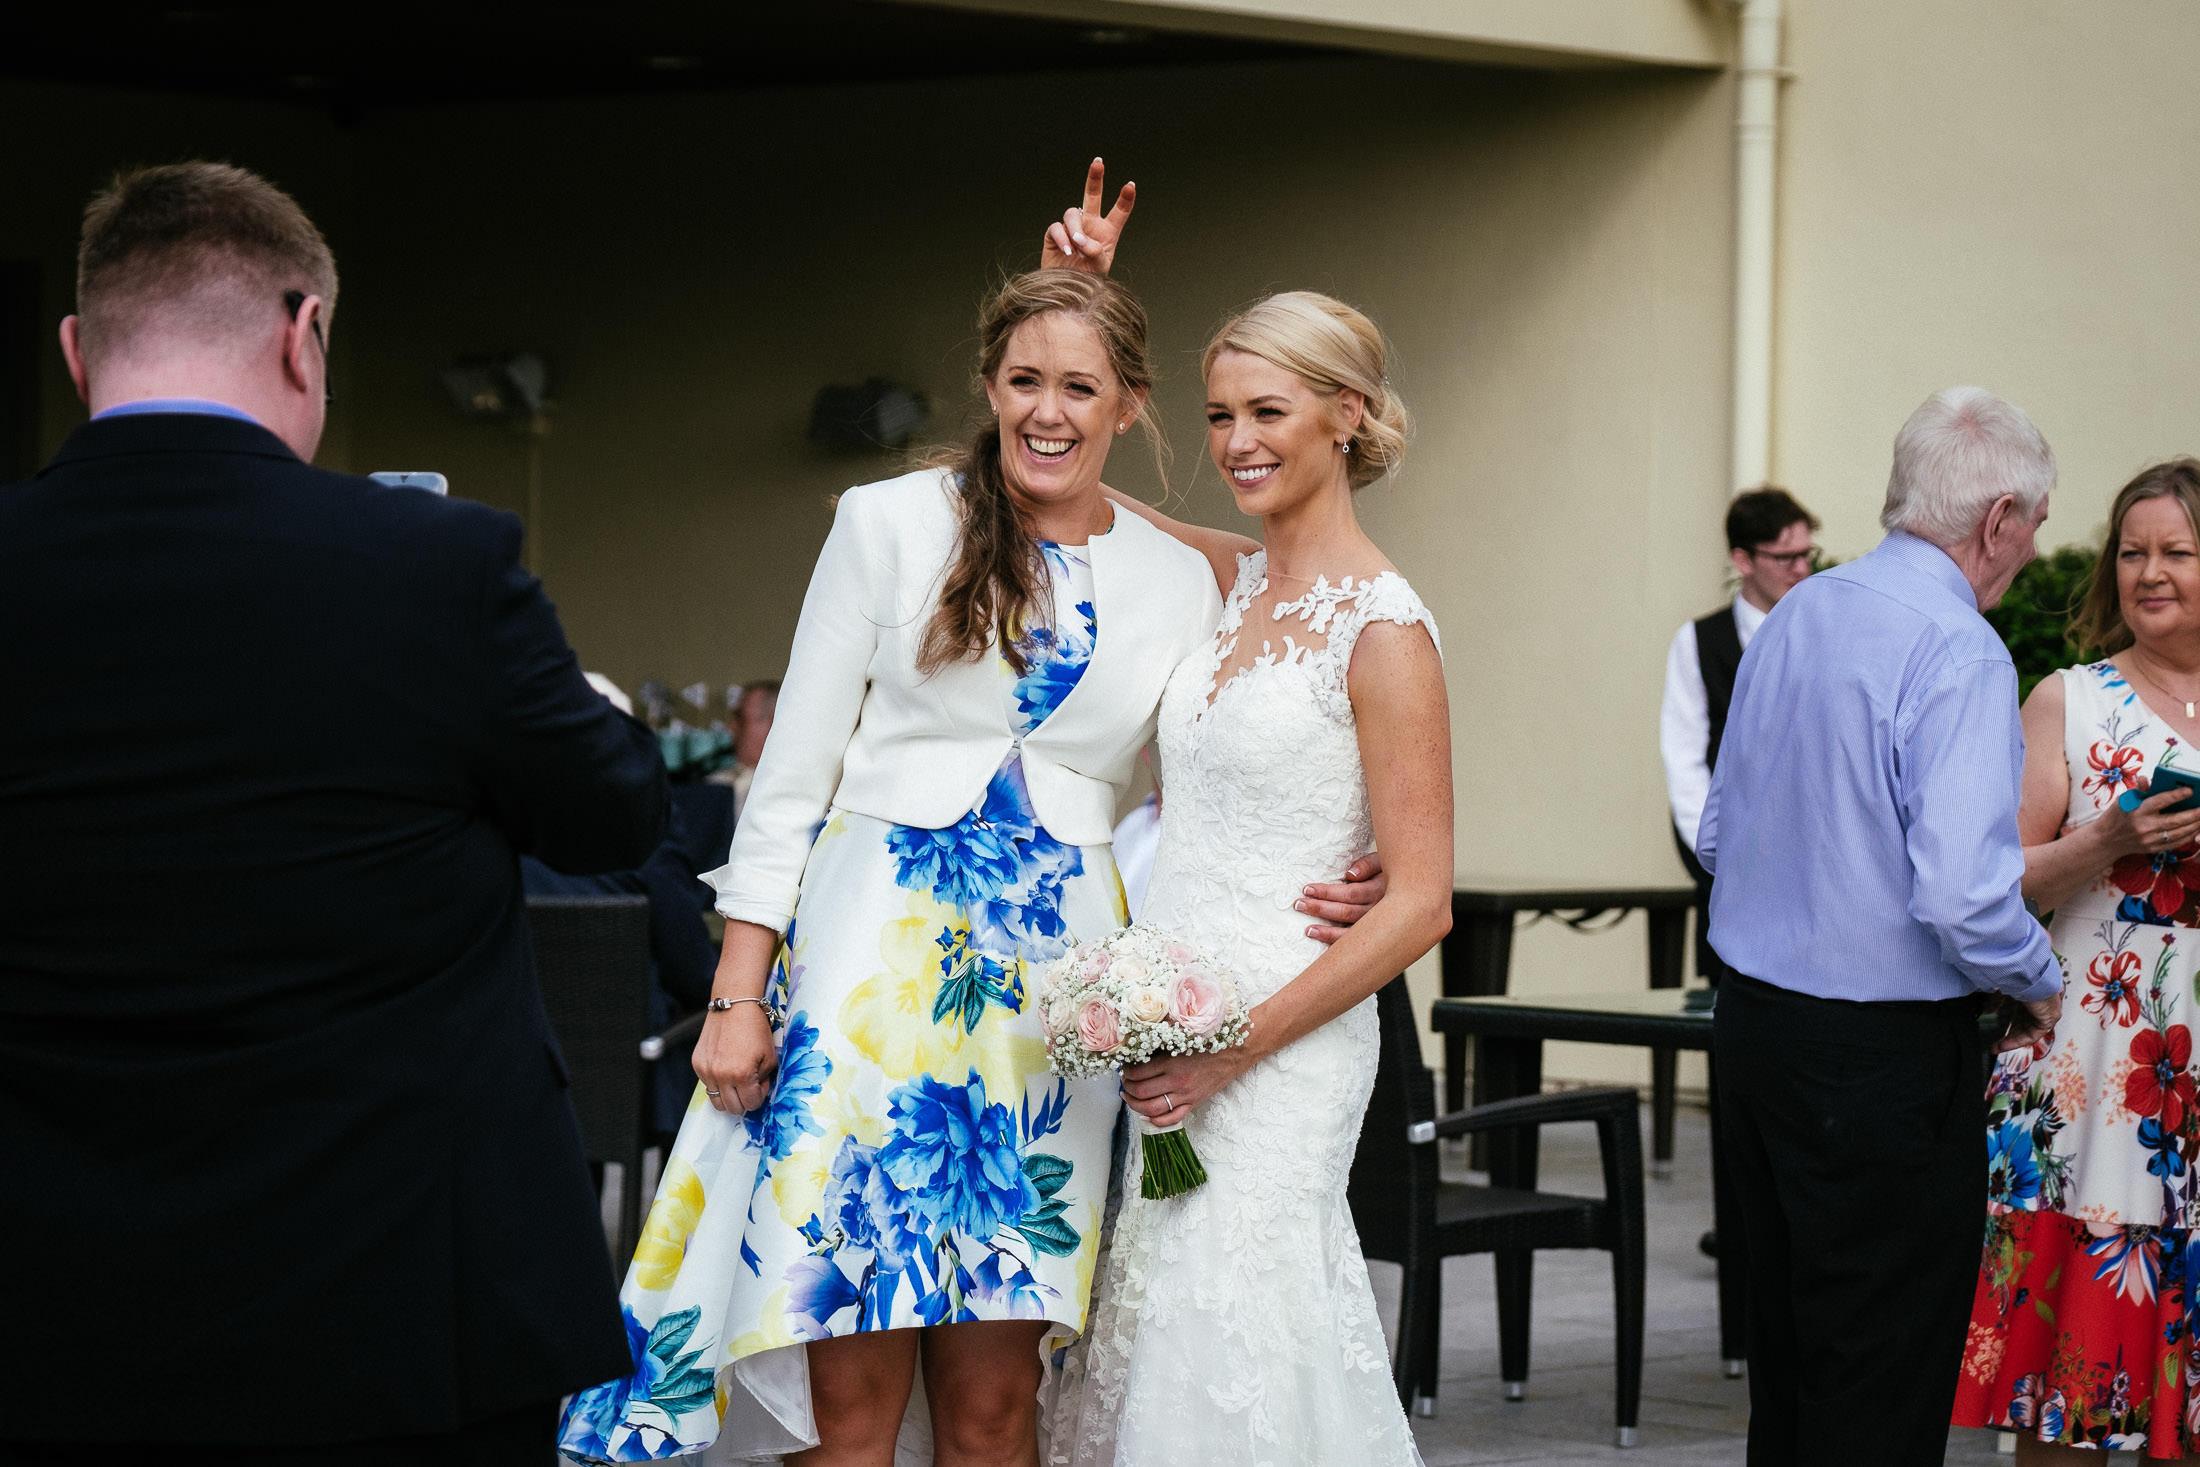 Knightsbrook Hotel Trim Castle Wedding Photographer 88